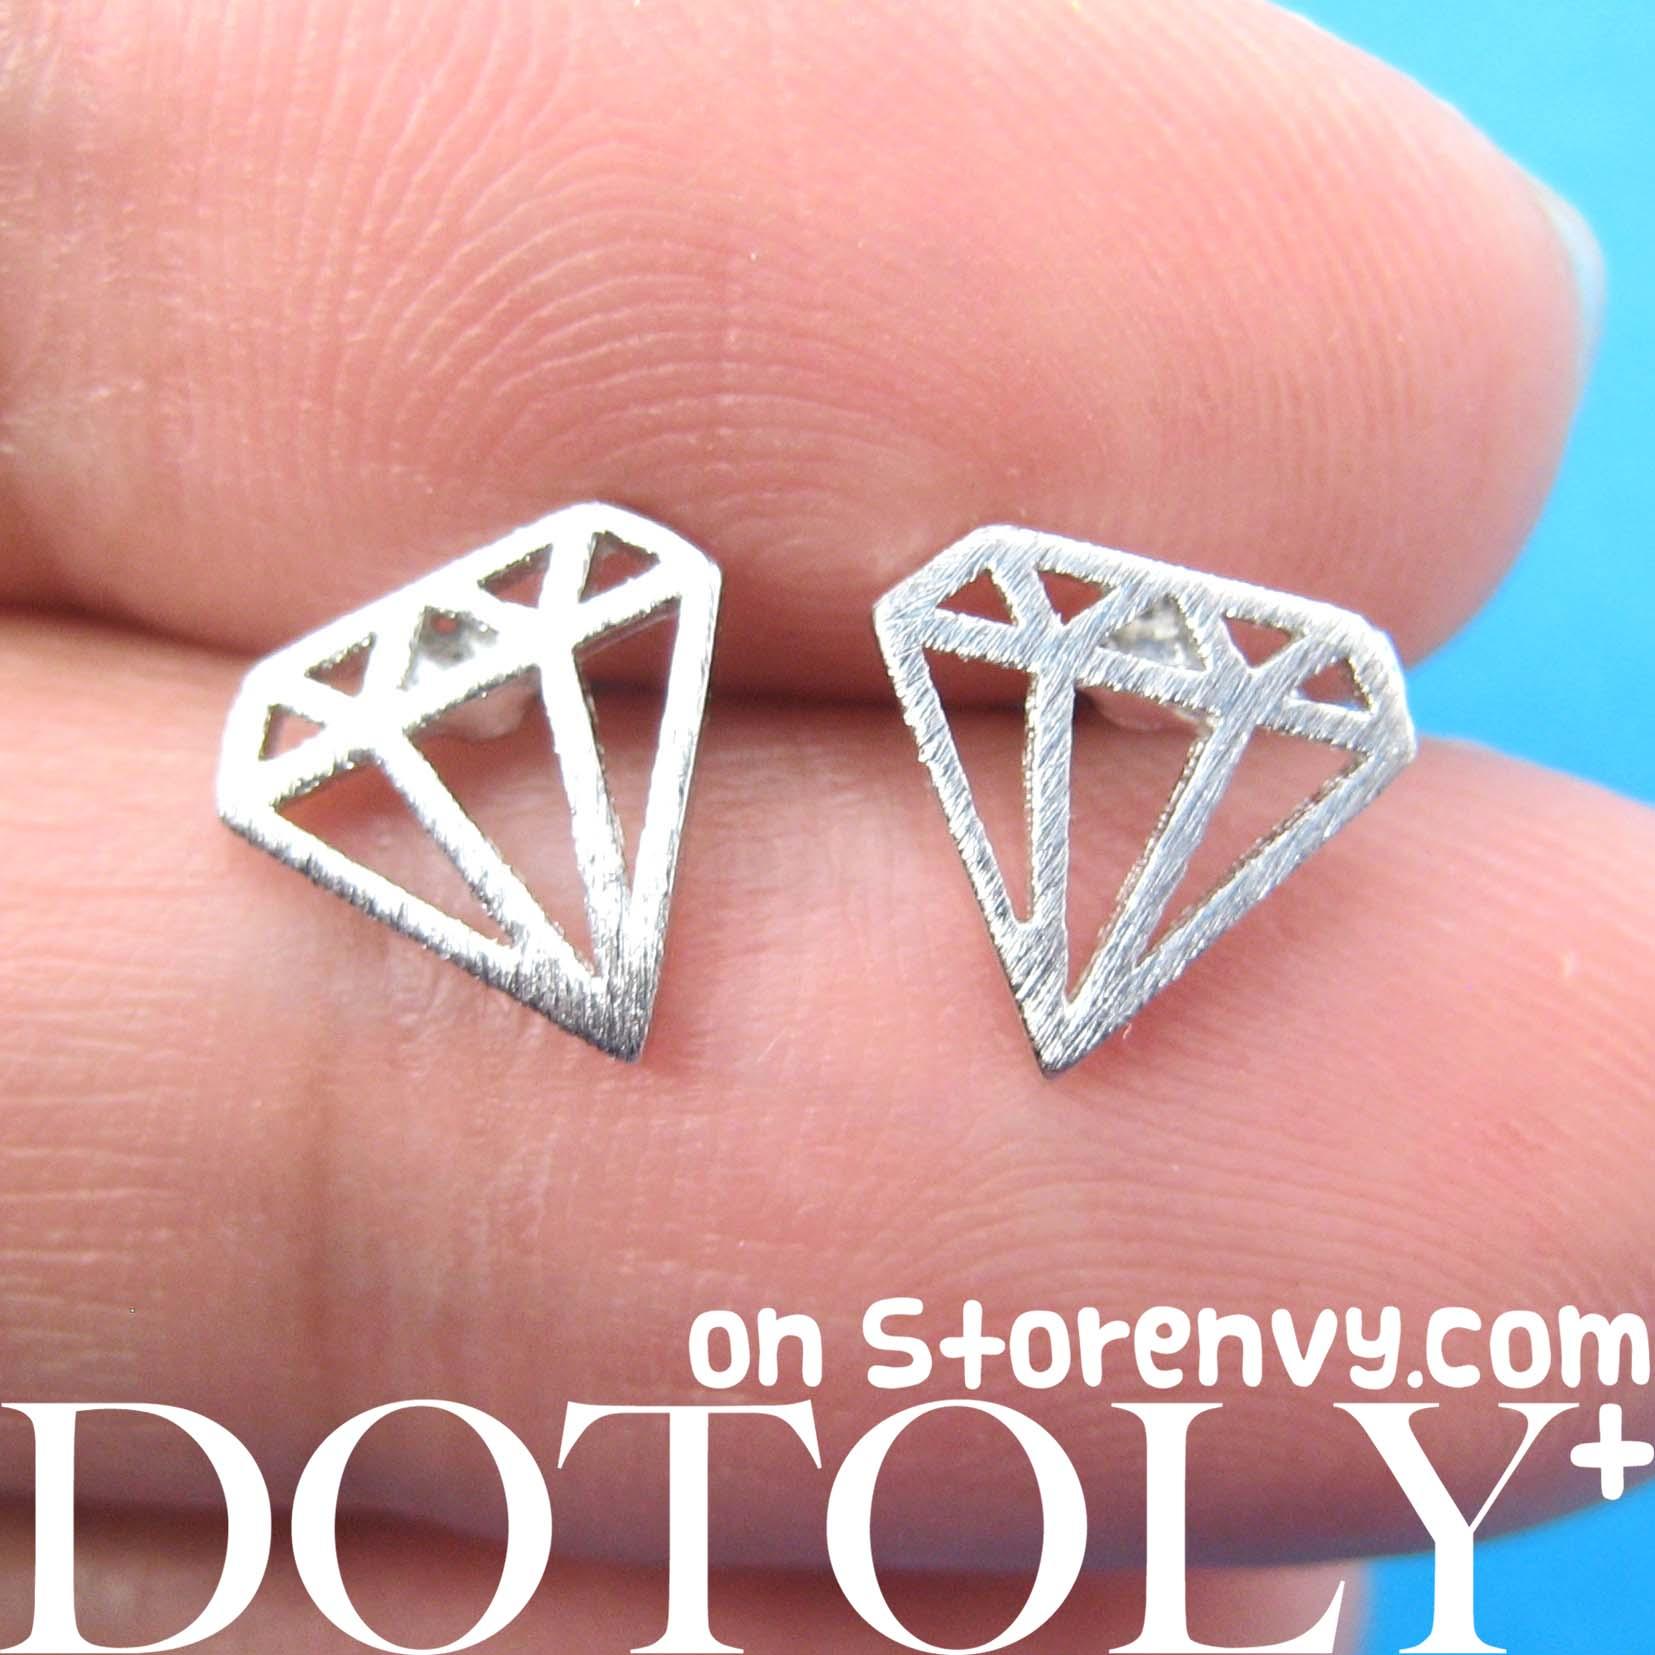 Diamond Shaped Stud Earrings in Sterling Silver  DOTOLY